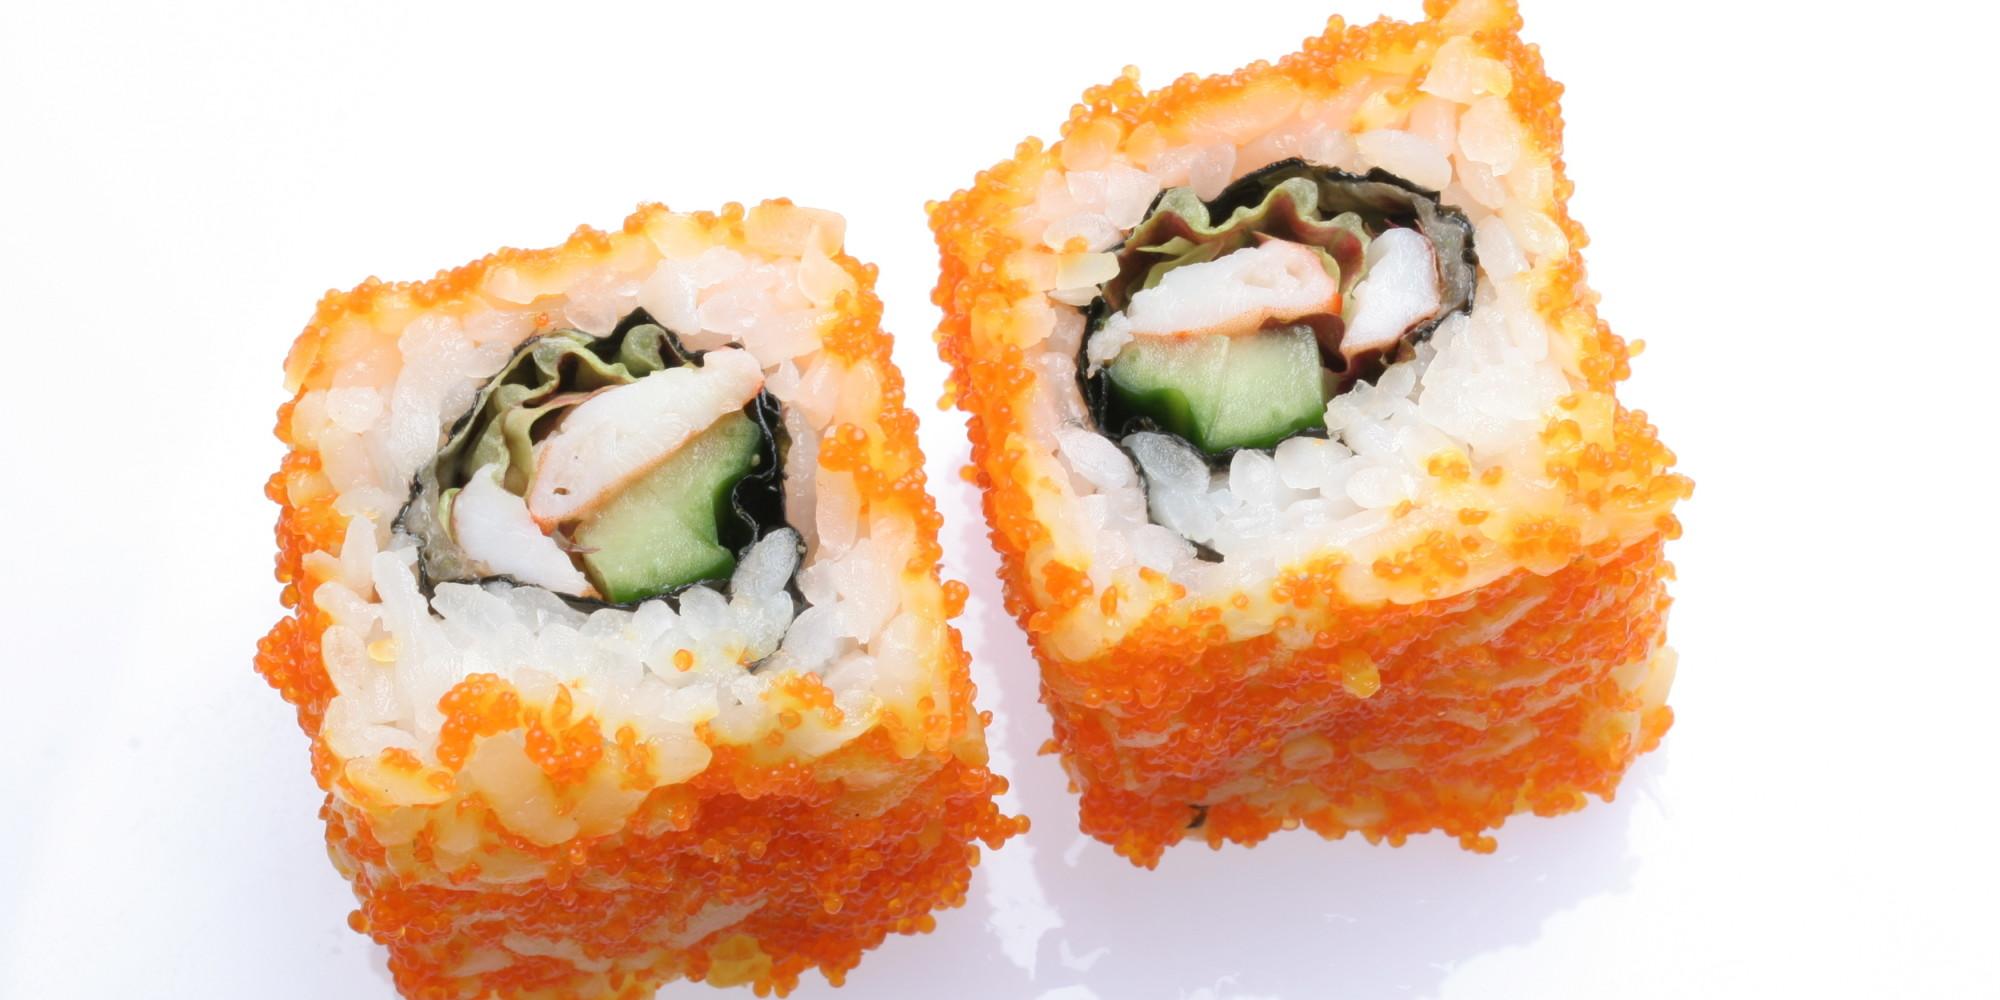 recipe: crab meat sushi filling [9]